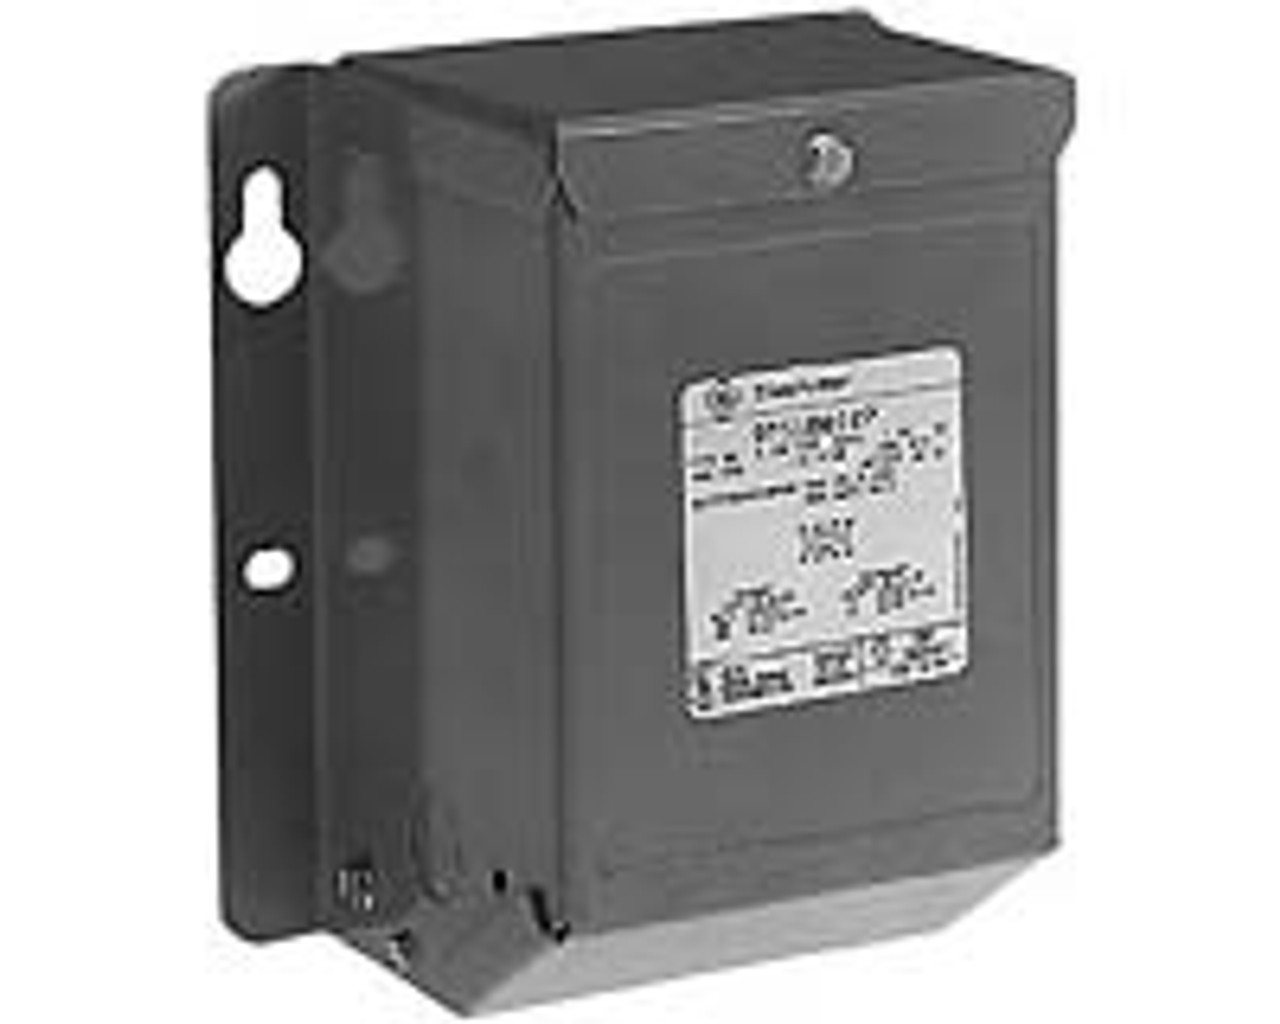 GE 9T51B0889 - 0.75 KVA 600 TO 120x240 VOLTS 1PH TRANSFORMER - New